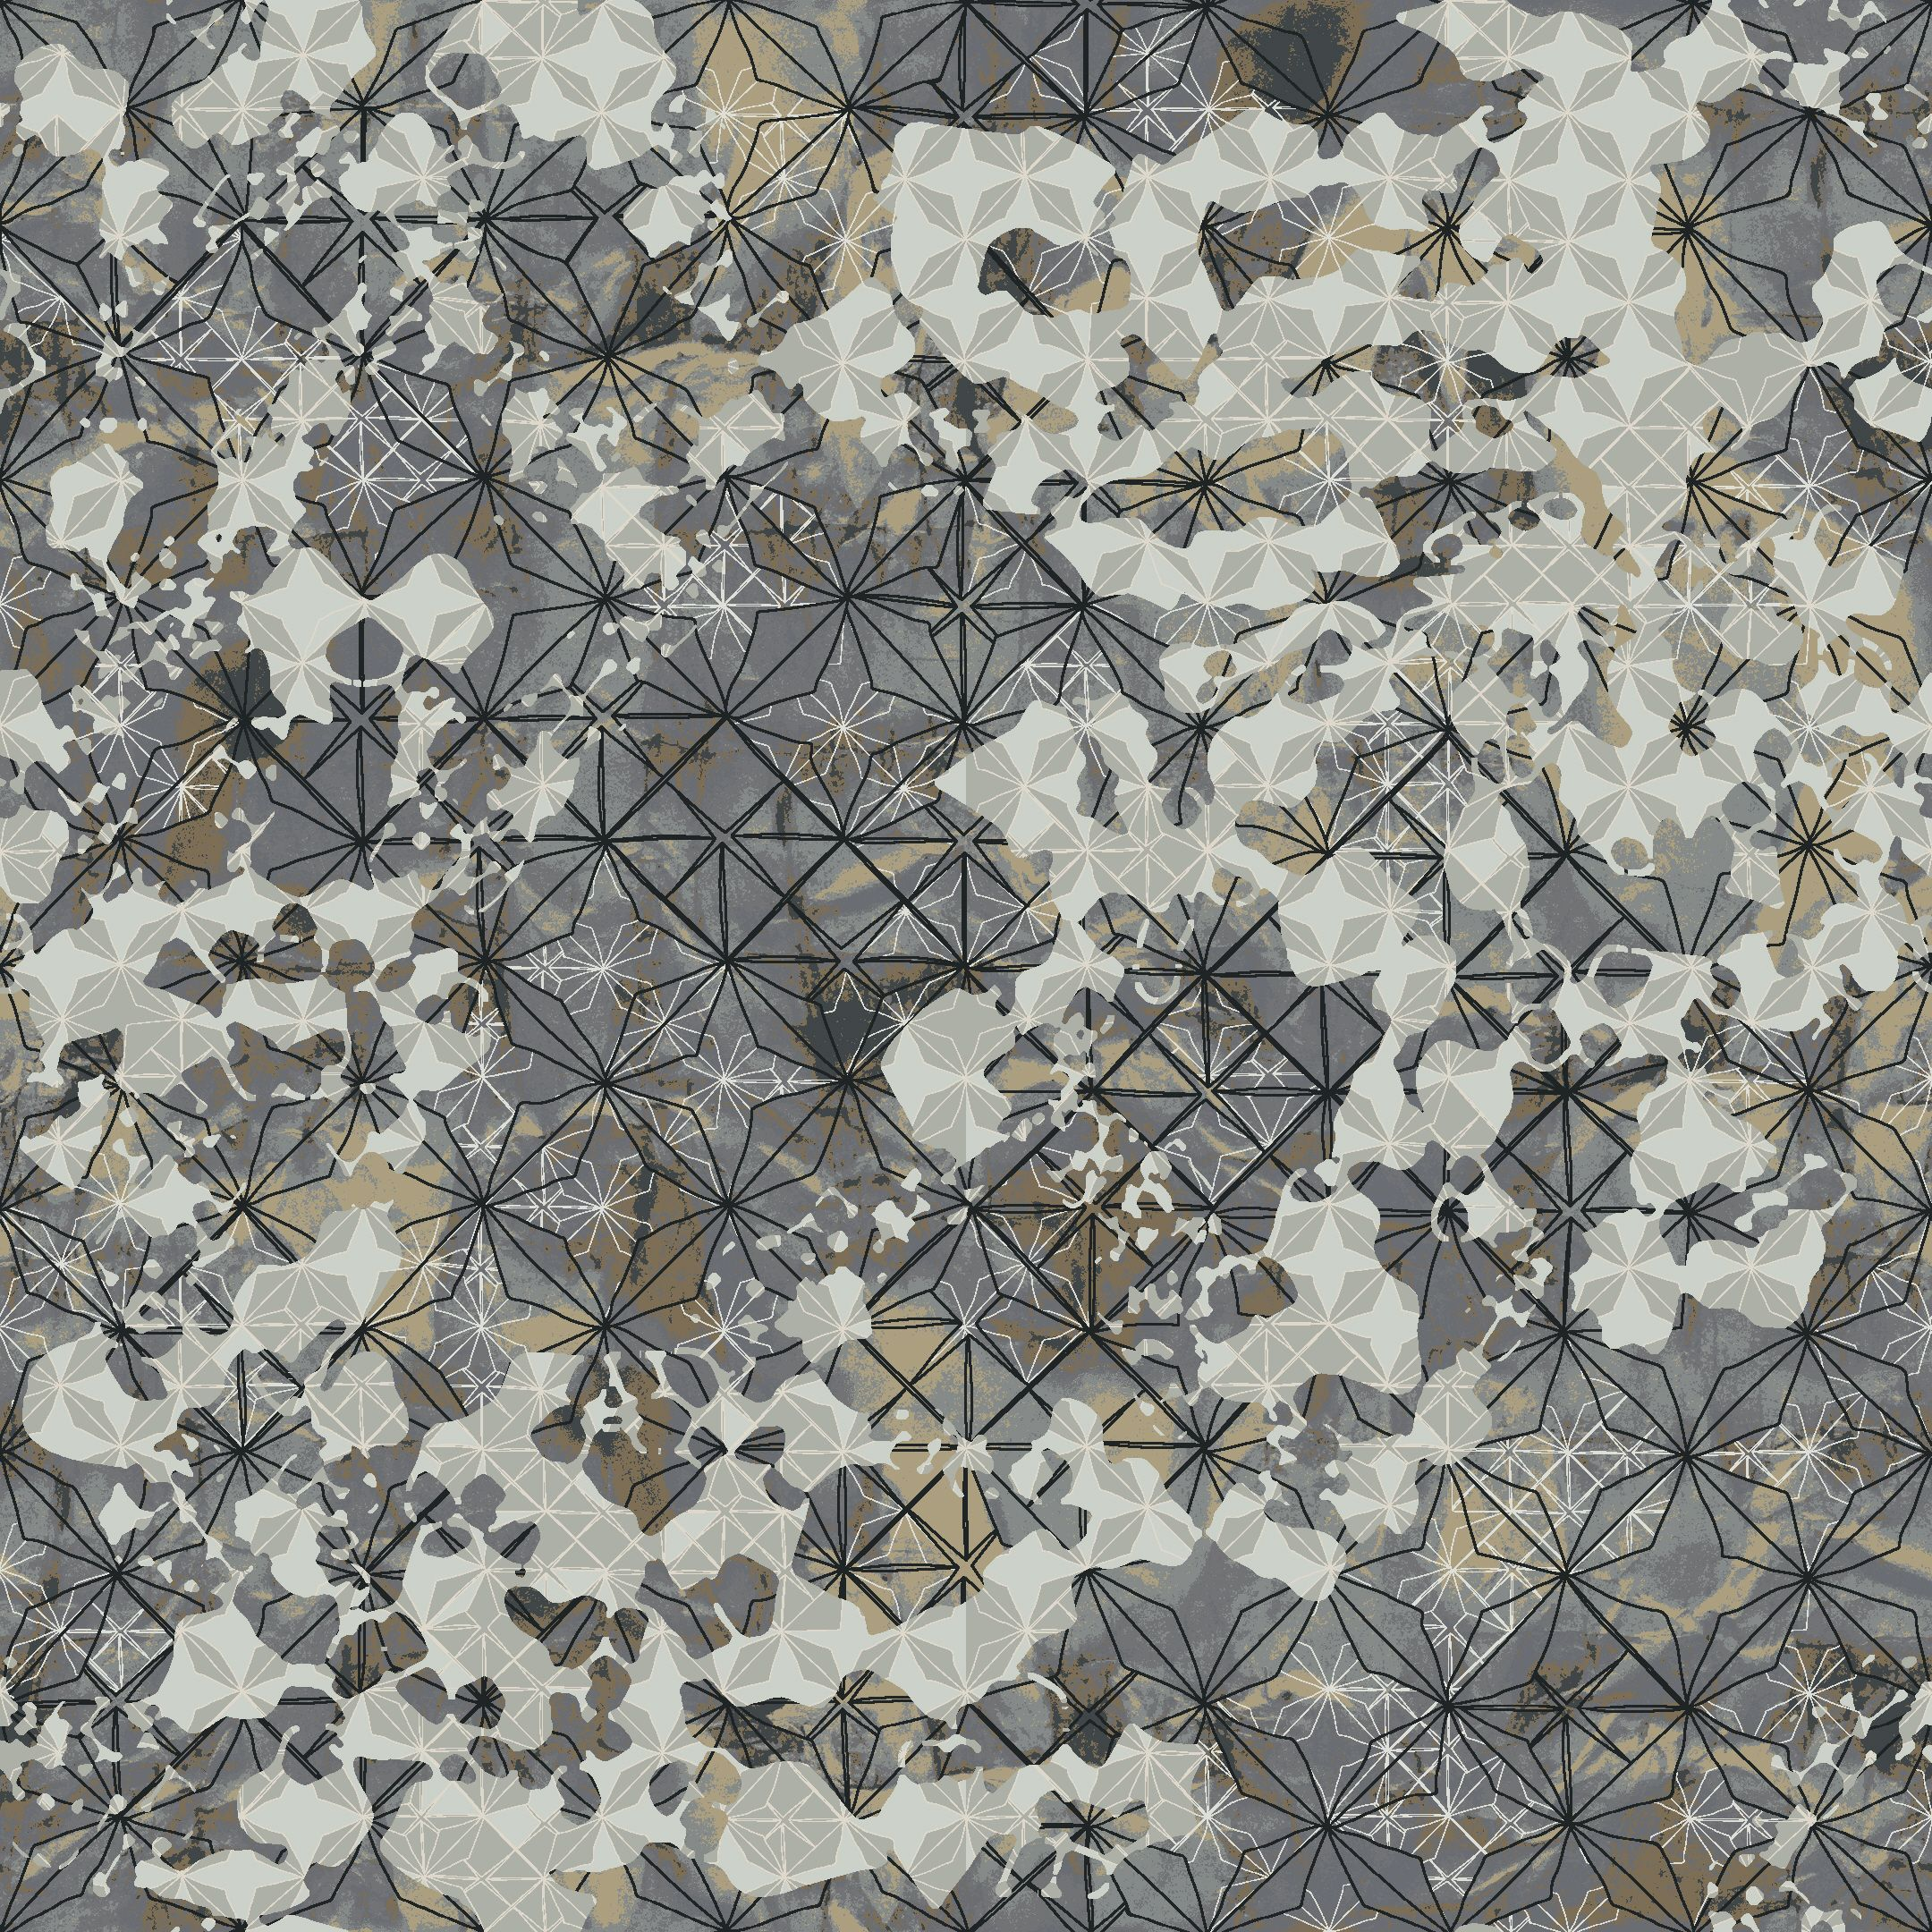 carpet 15 x 15. qtw43670 15\u0027 w x l #durkan #hospitalitydesign #products #carpet carpet 15 u